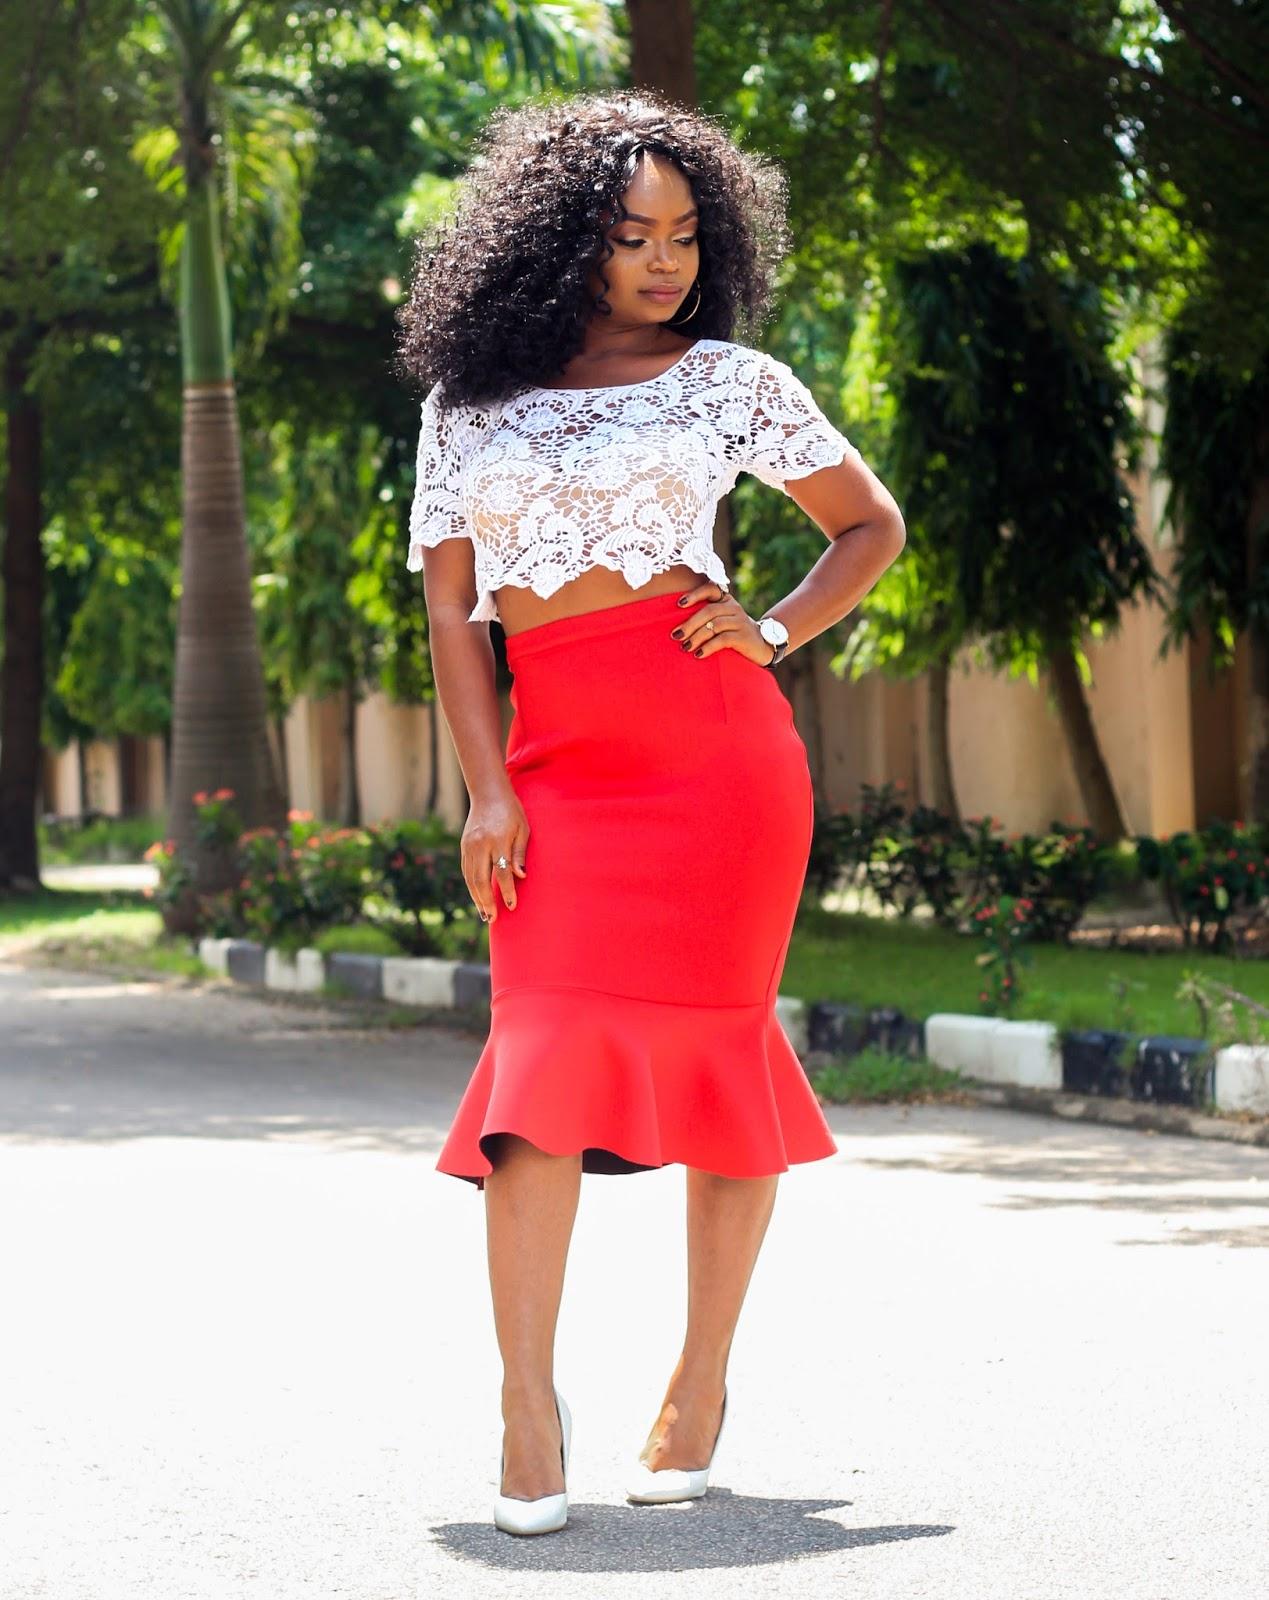 PEPLUM HEM SKIRT - Styling Red Peplum Hem Skirt from Choies and White Lace Crop Top